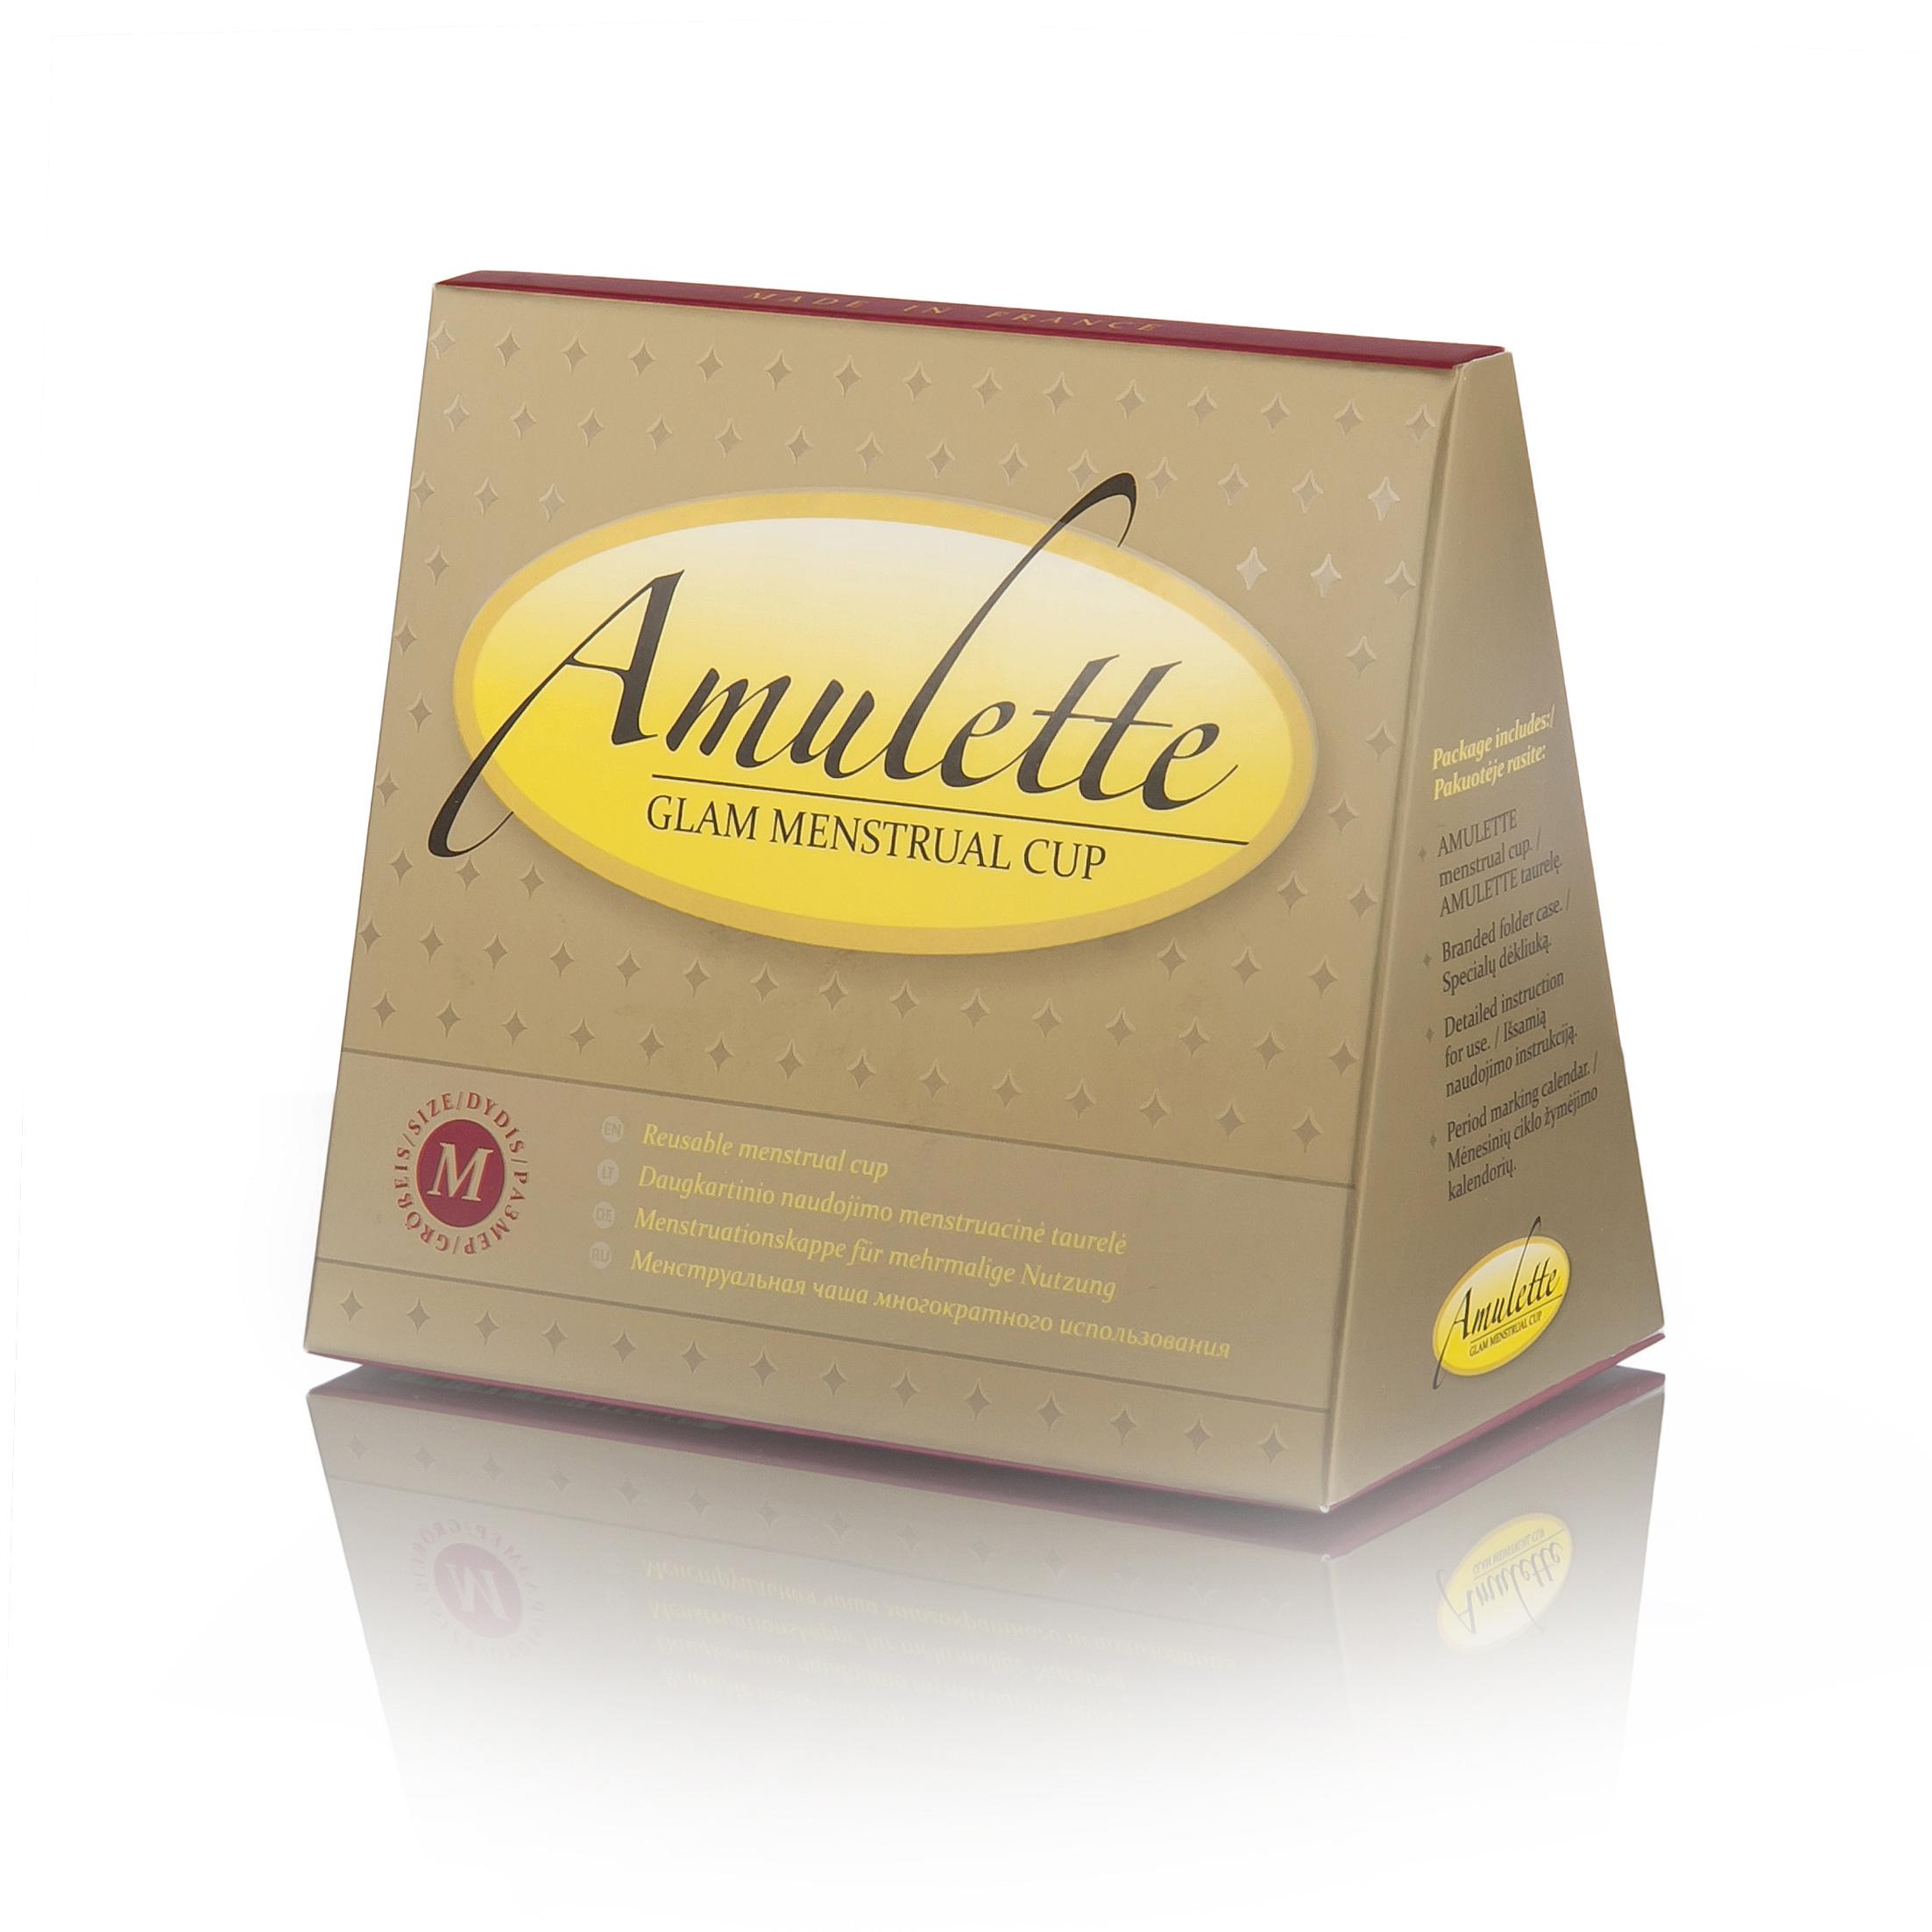 Amulette-taurele-m-dydis